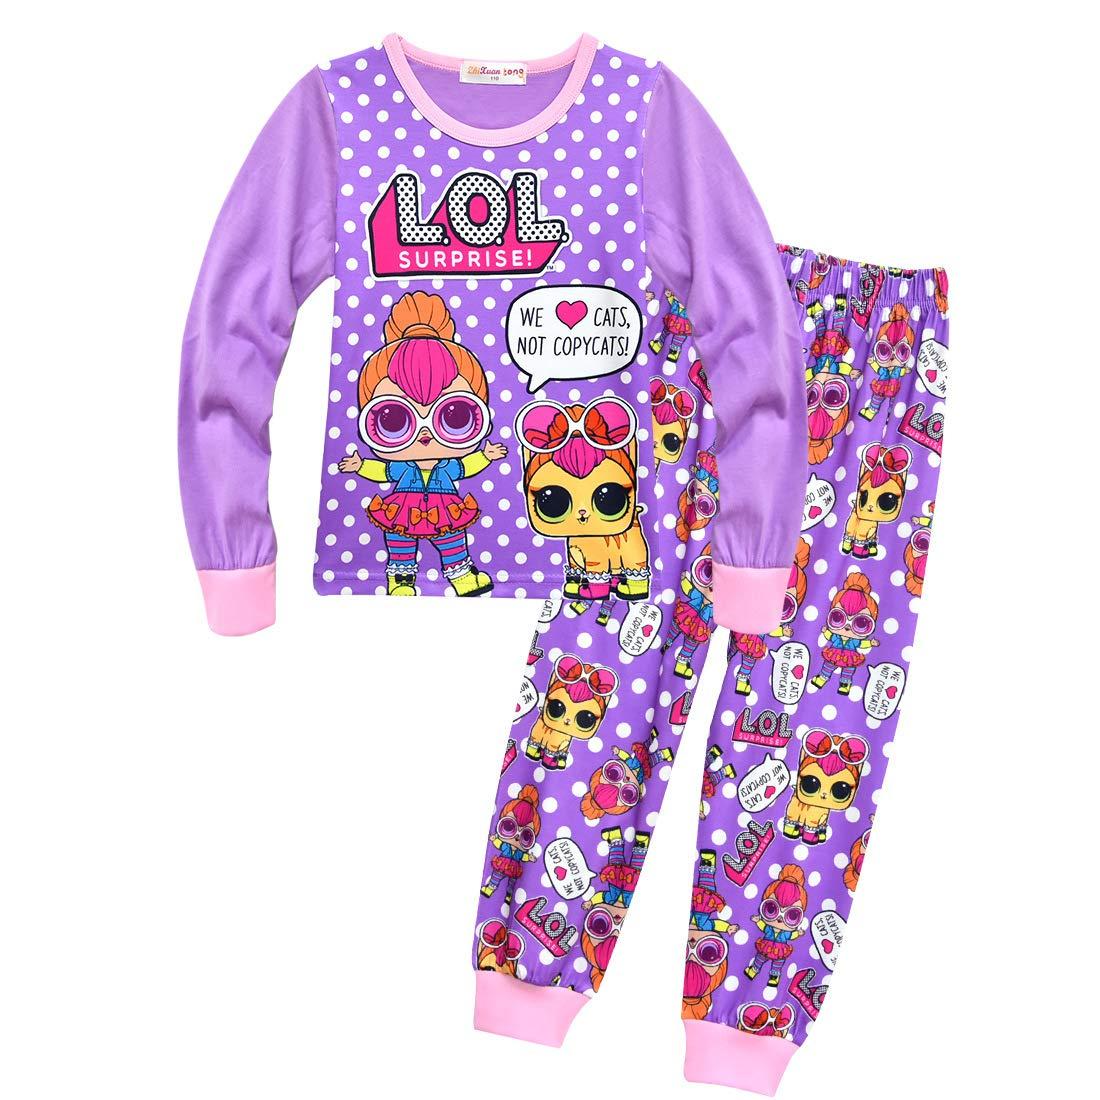 Dgfstm Christmas Girls Cute Confetti Pop Lil Sisters & Pets Pjs Pyjamas Set Nighties